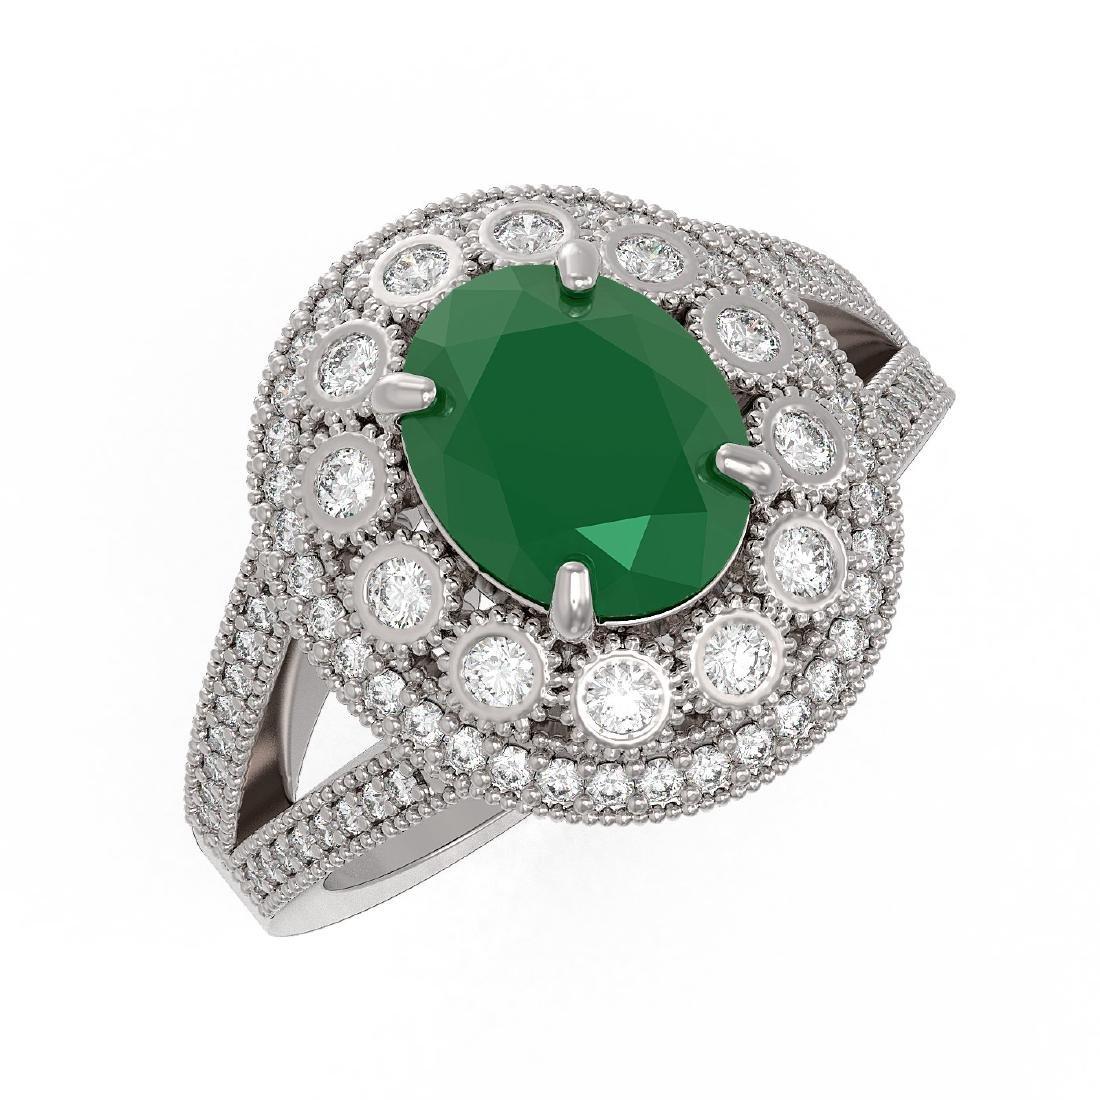 4.55 ctw Emerald & Diamond Ring 14K White Gold -